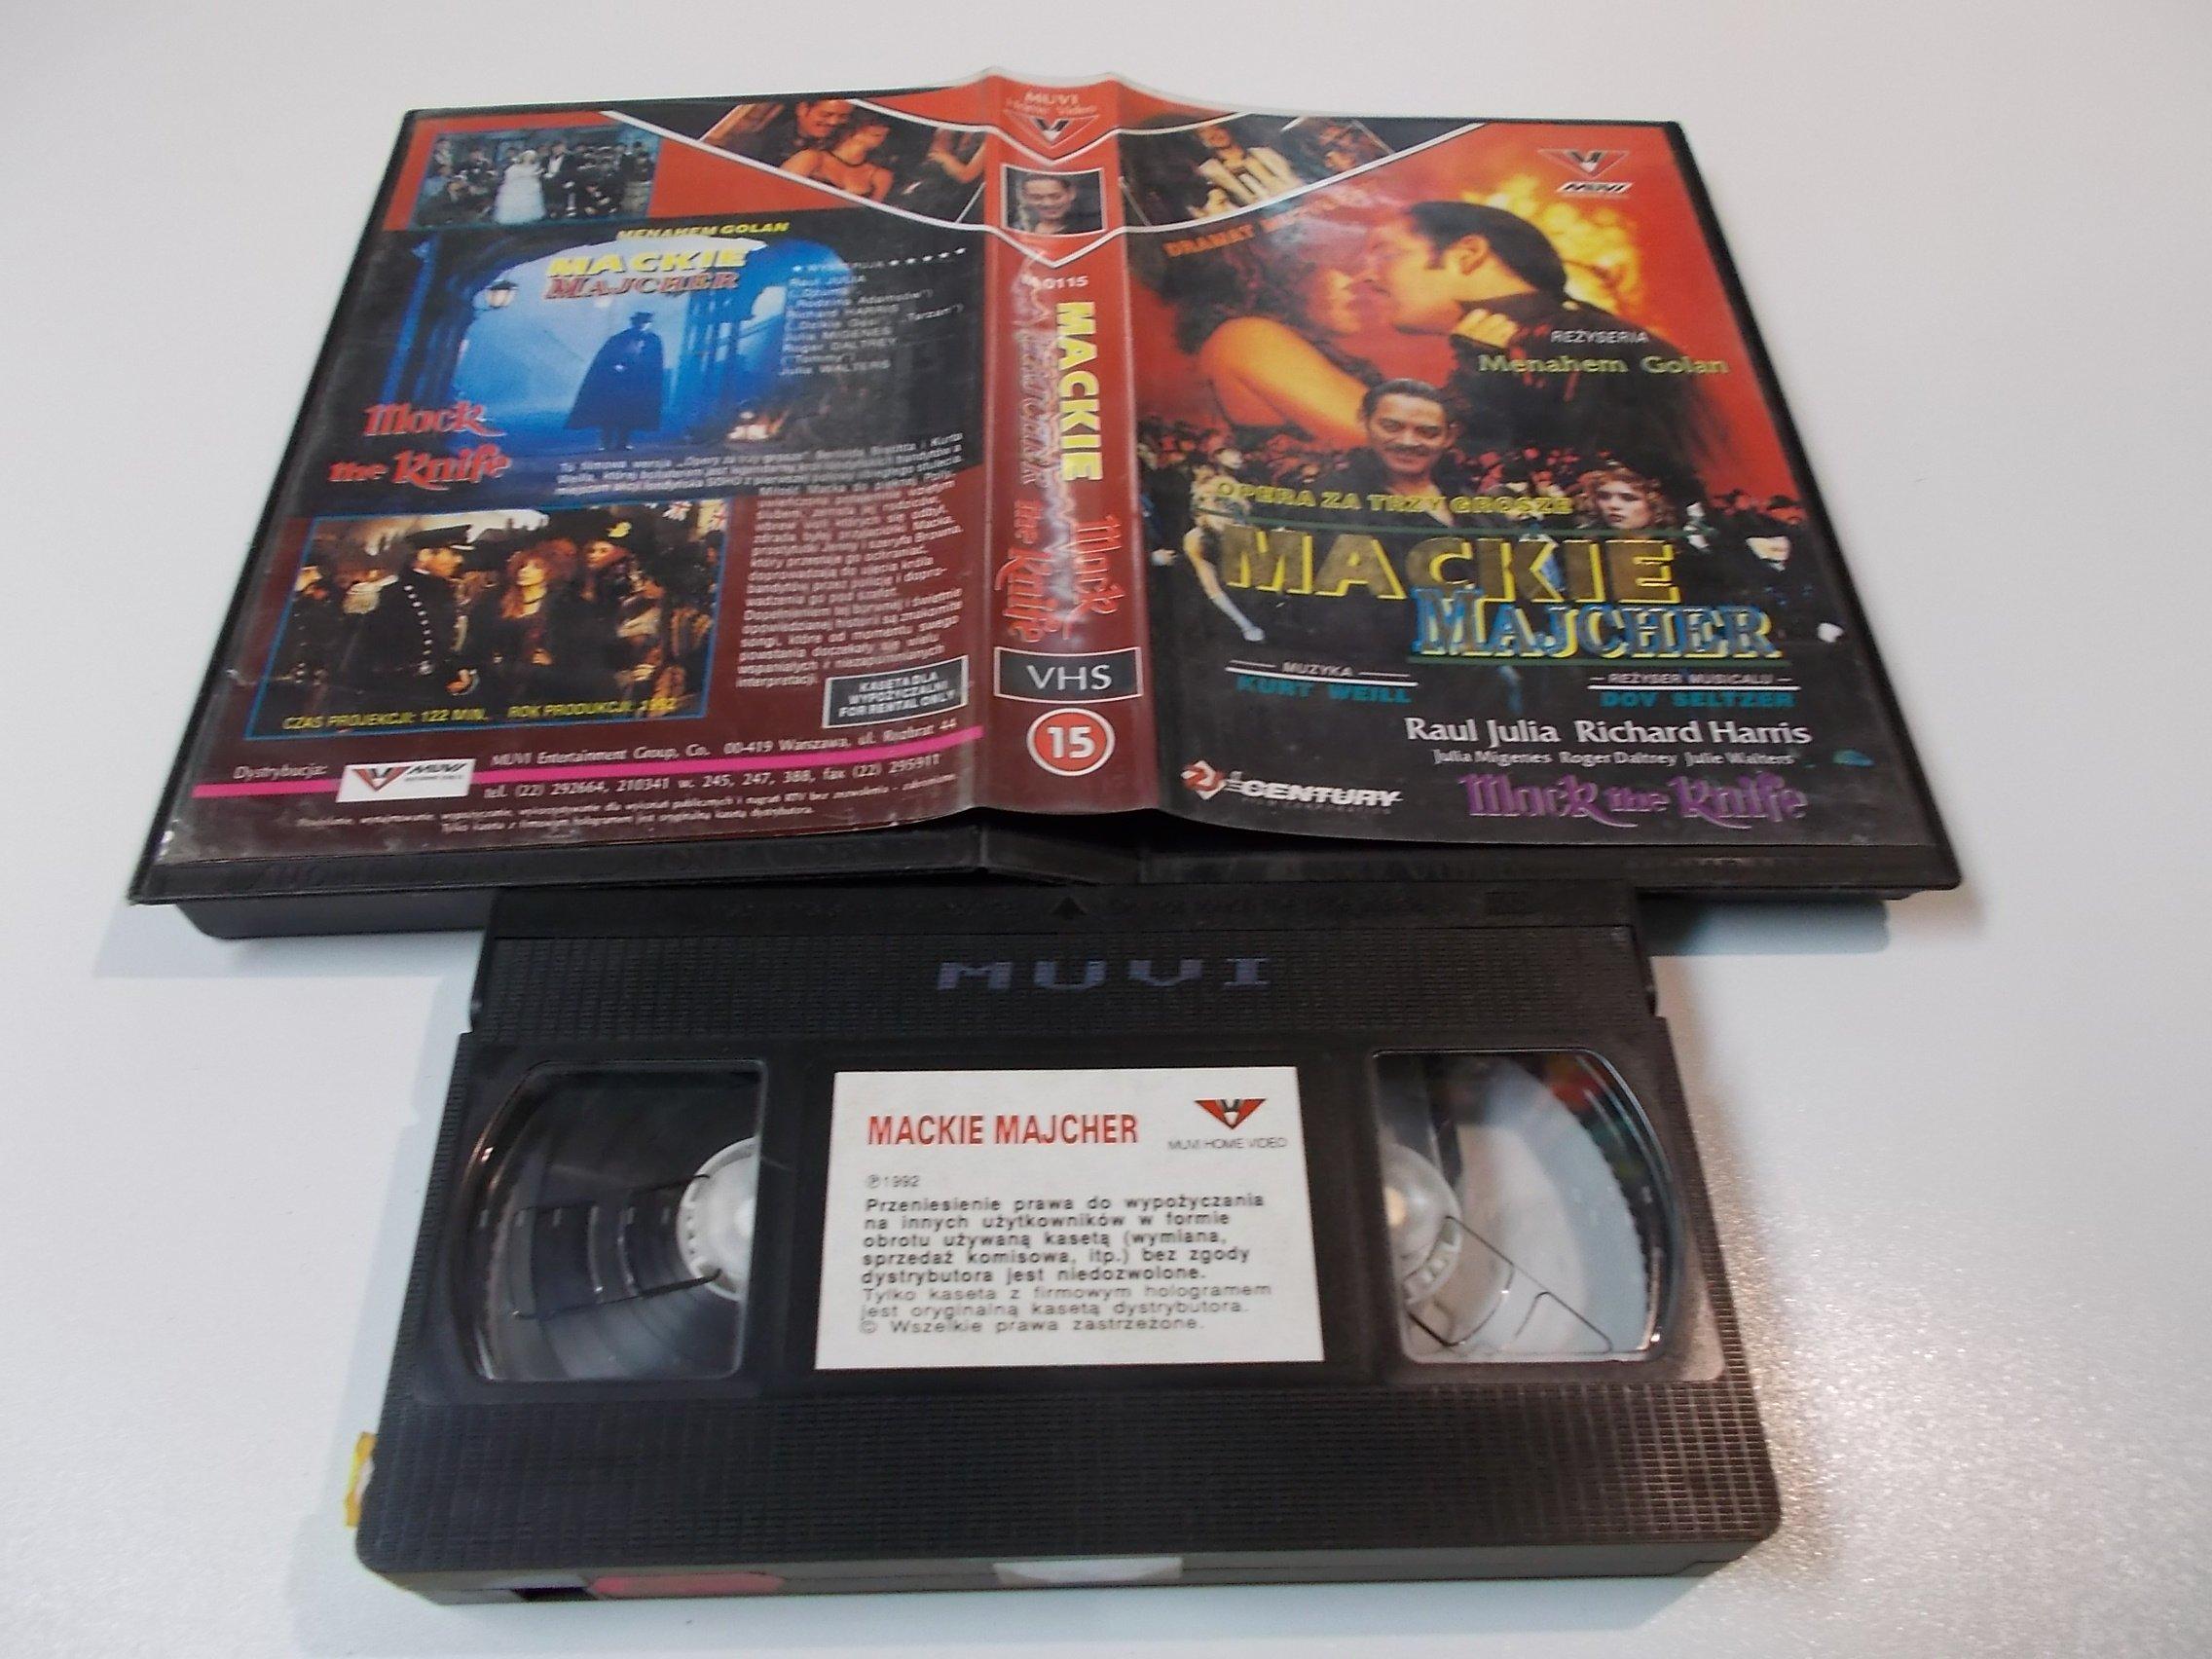 MACKIE MAJCHER - kaseta Video VHS - 1441 Sklep